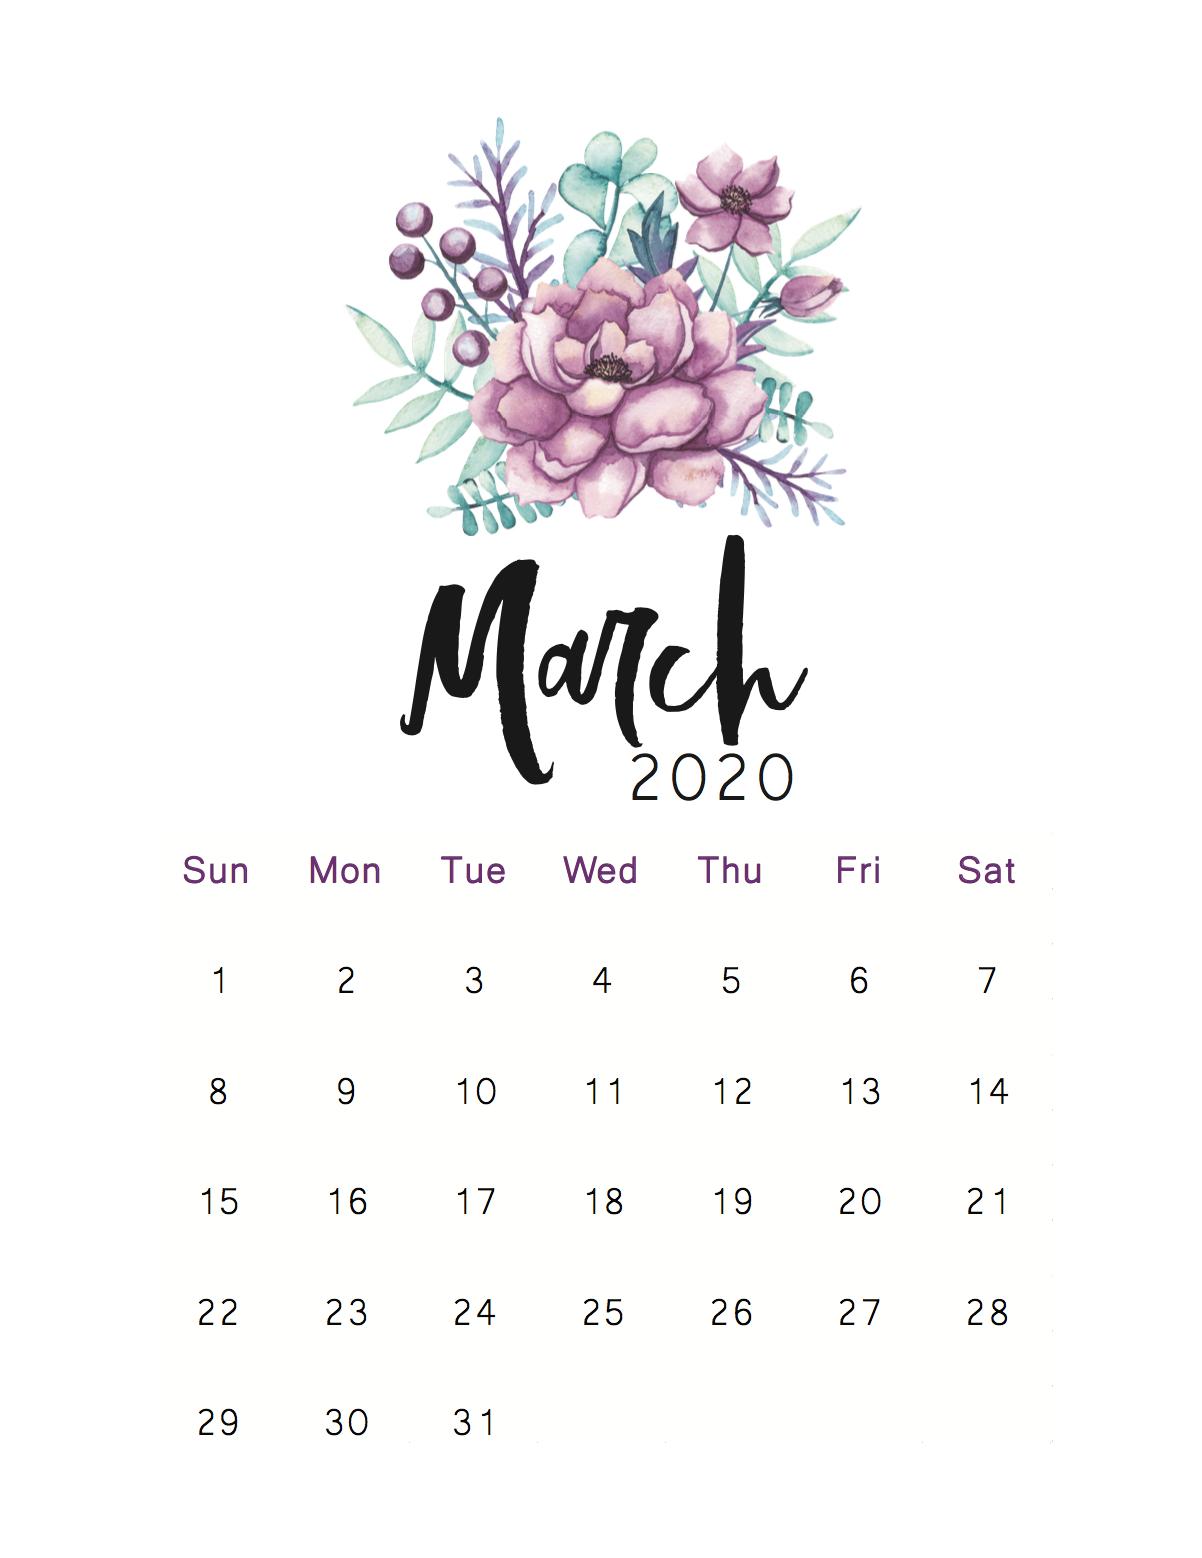 Floral March 2020 Wall Calendar